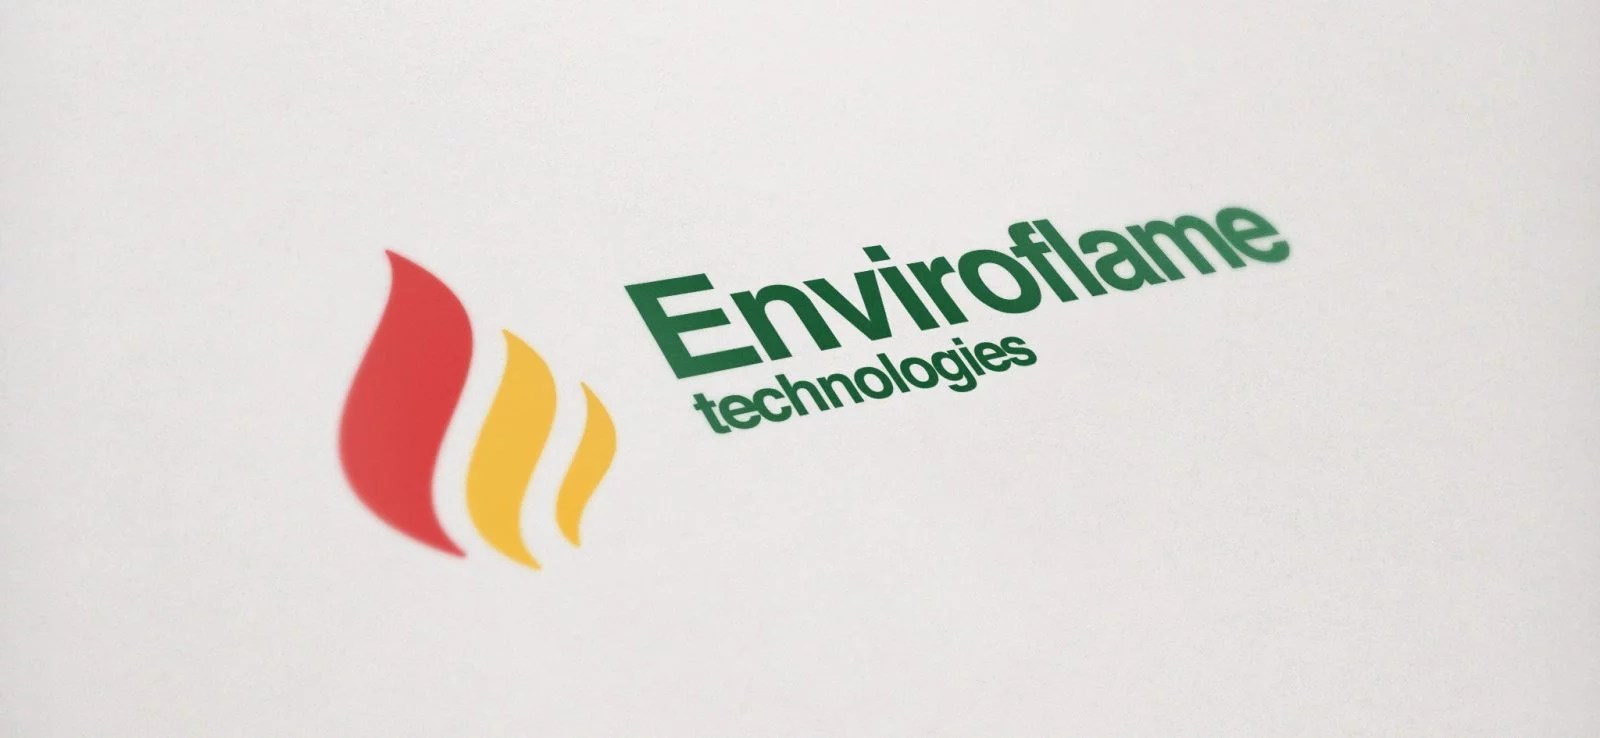 Enviroflame Technologies - Logo Design - Lethbridge, AB